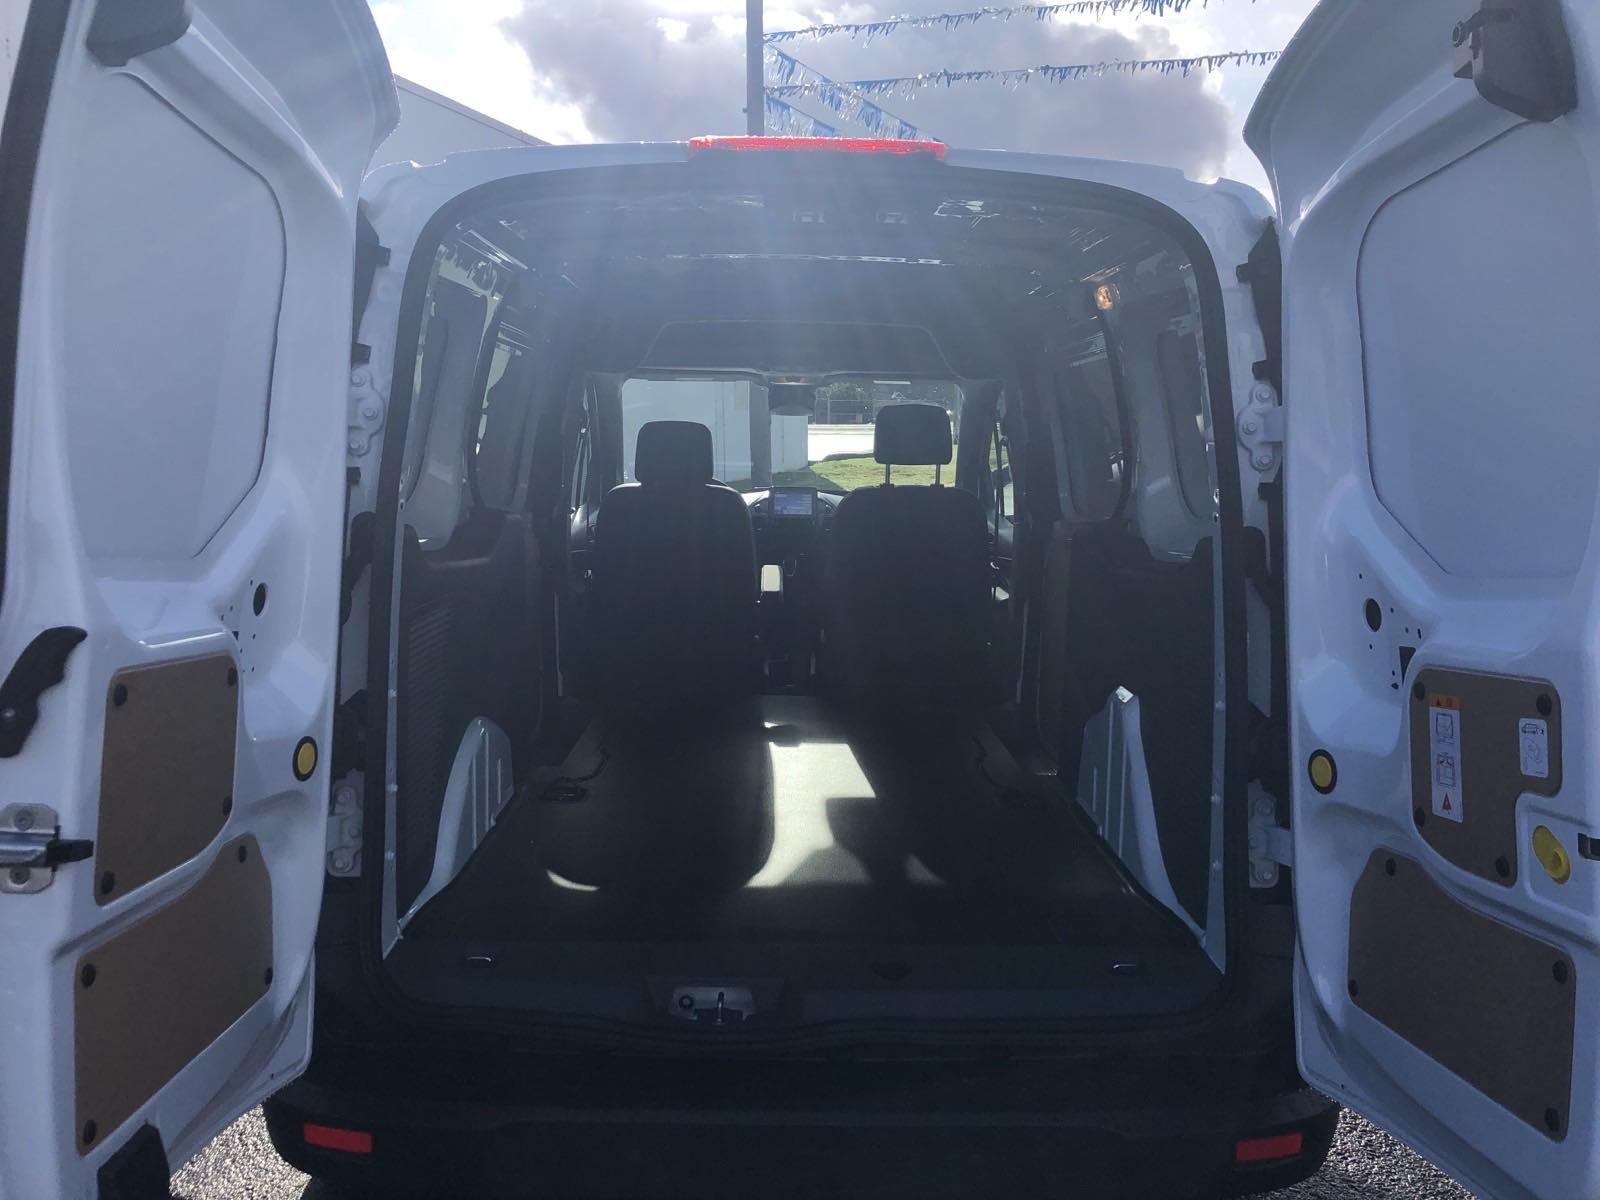 2020 Transit Connect, Empty Cargo Van #208521 - photo 1